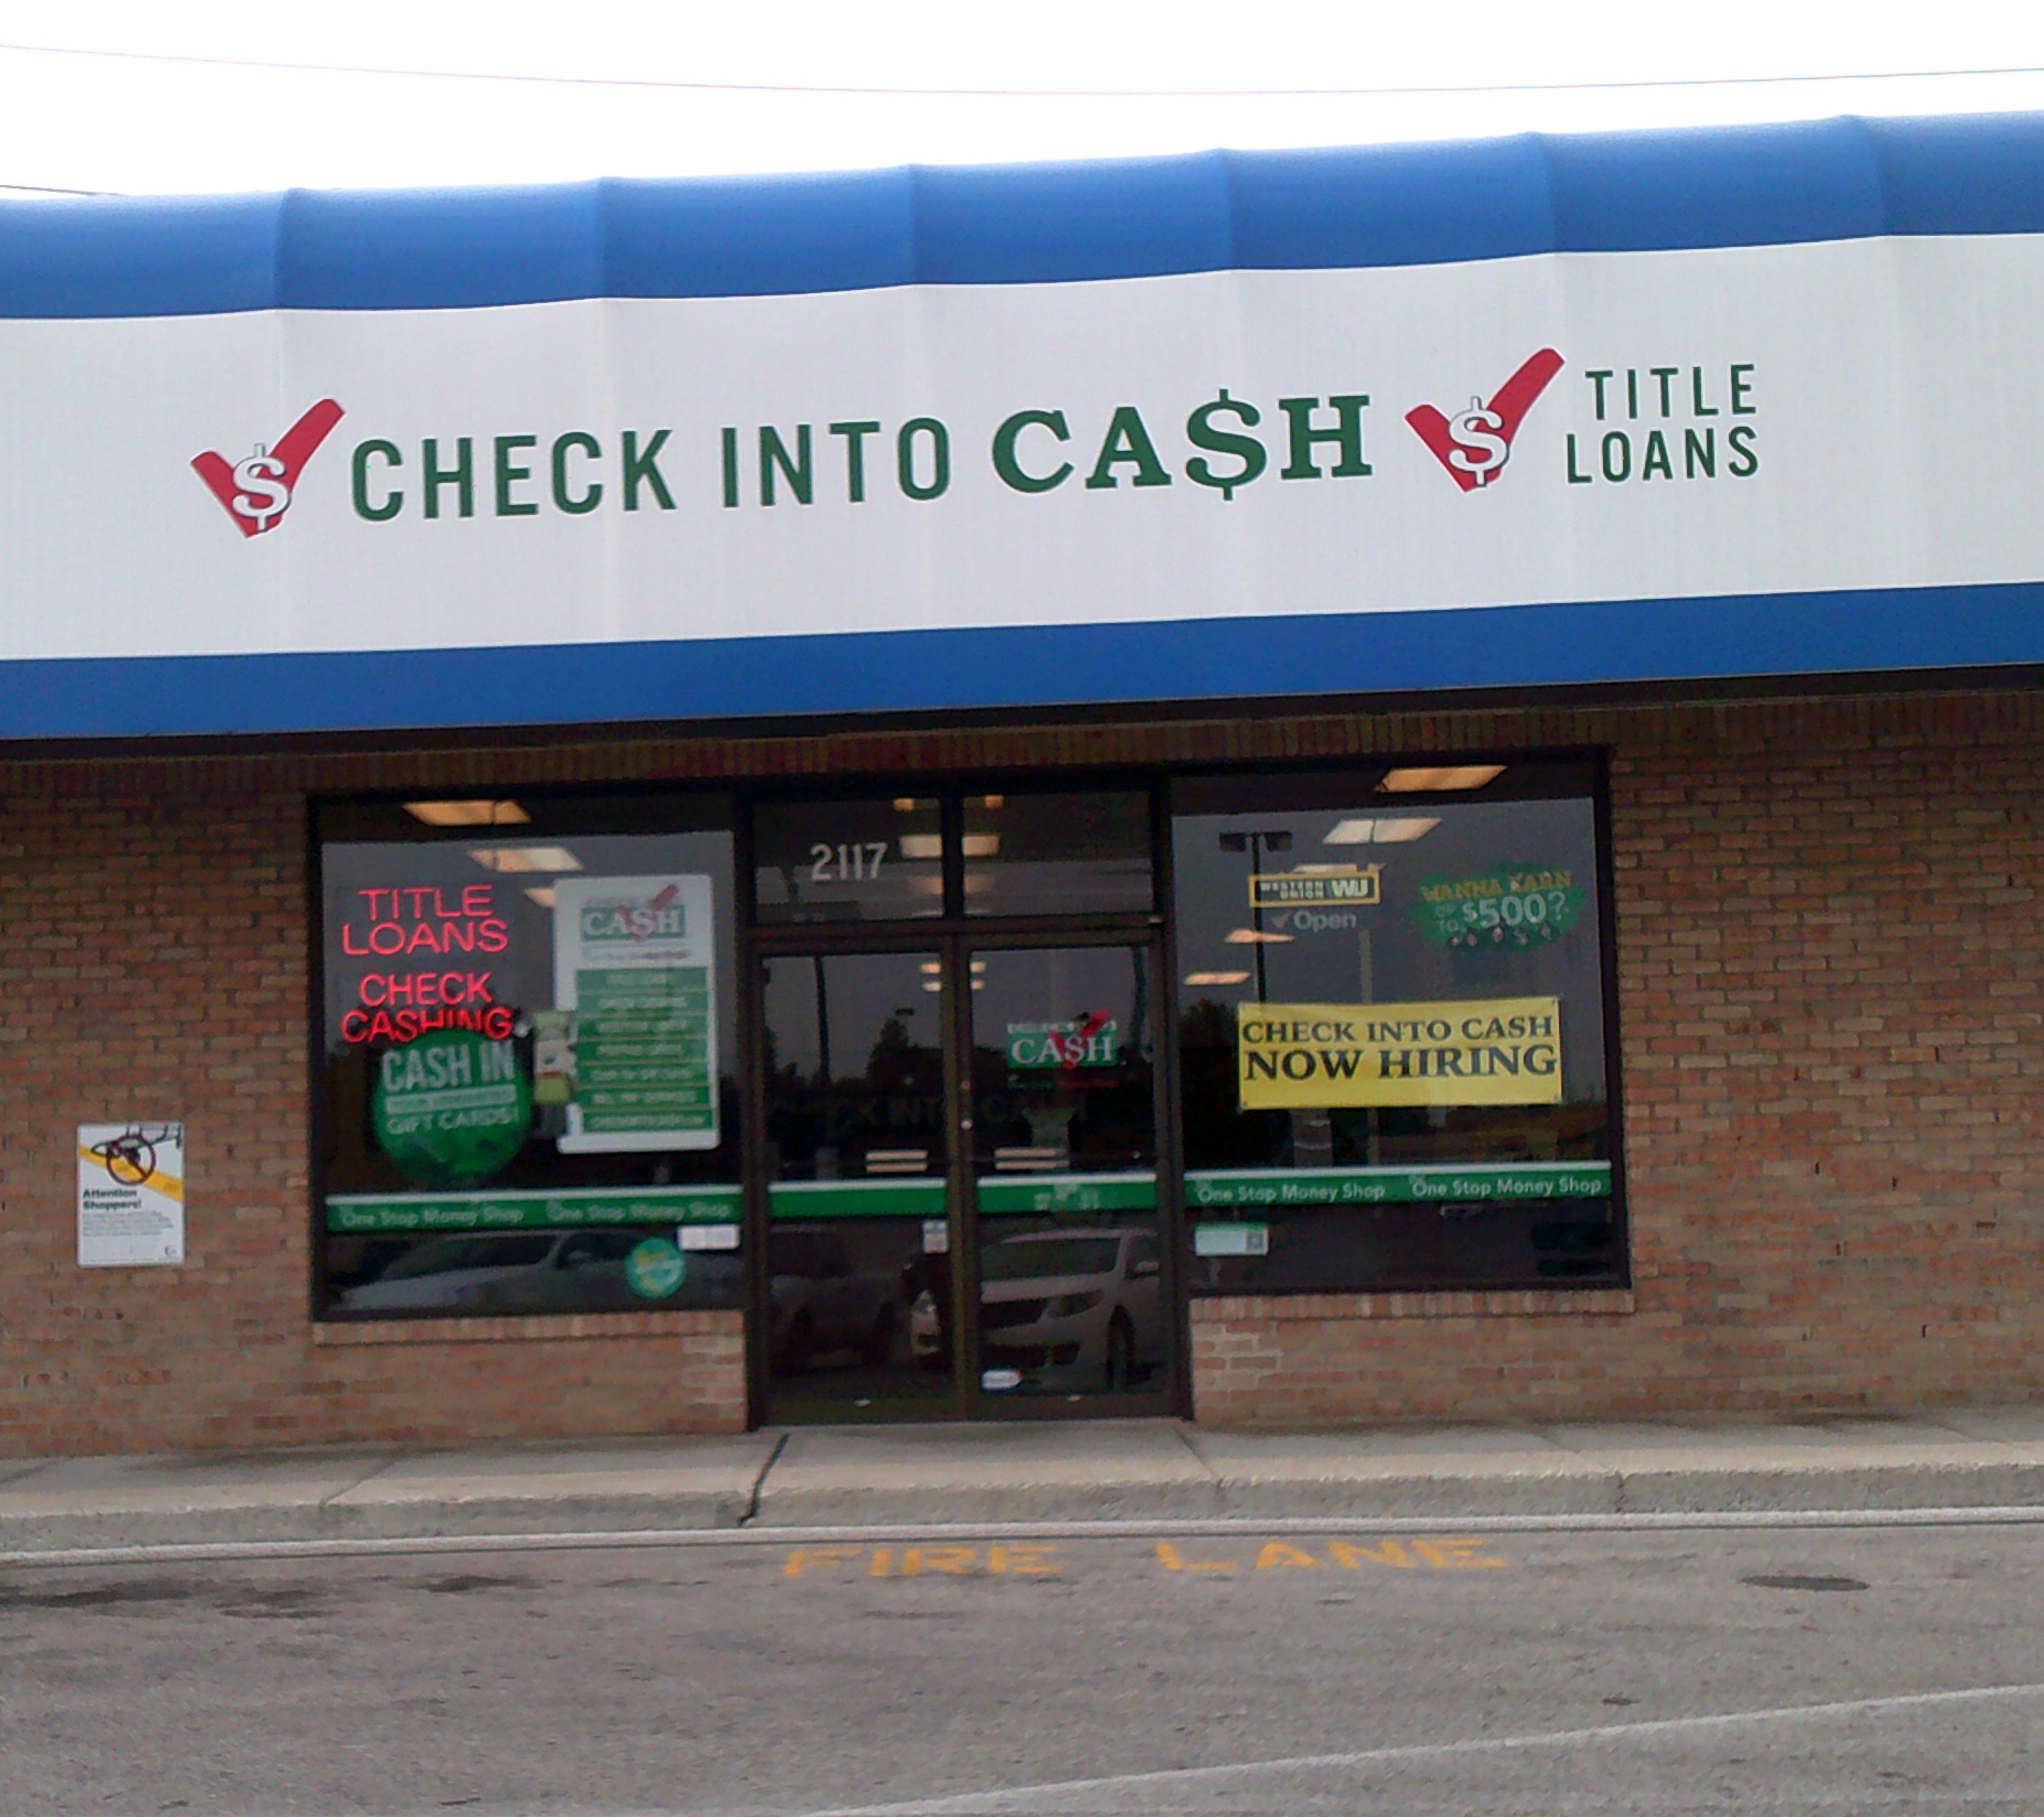 Absa bank payday loans photo 7